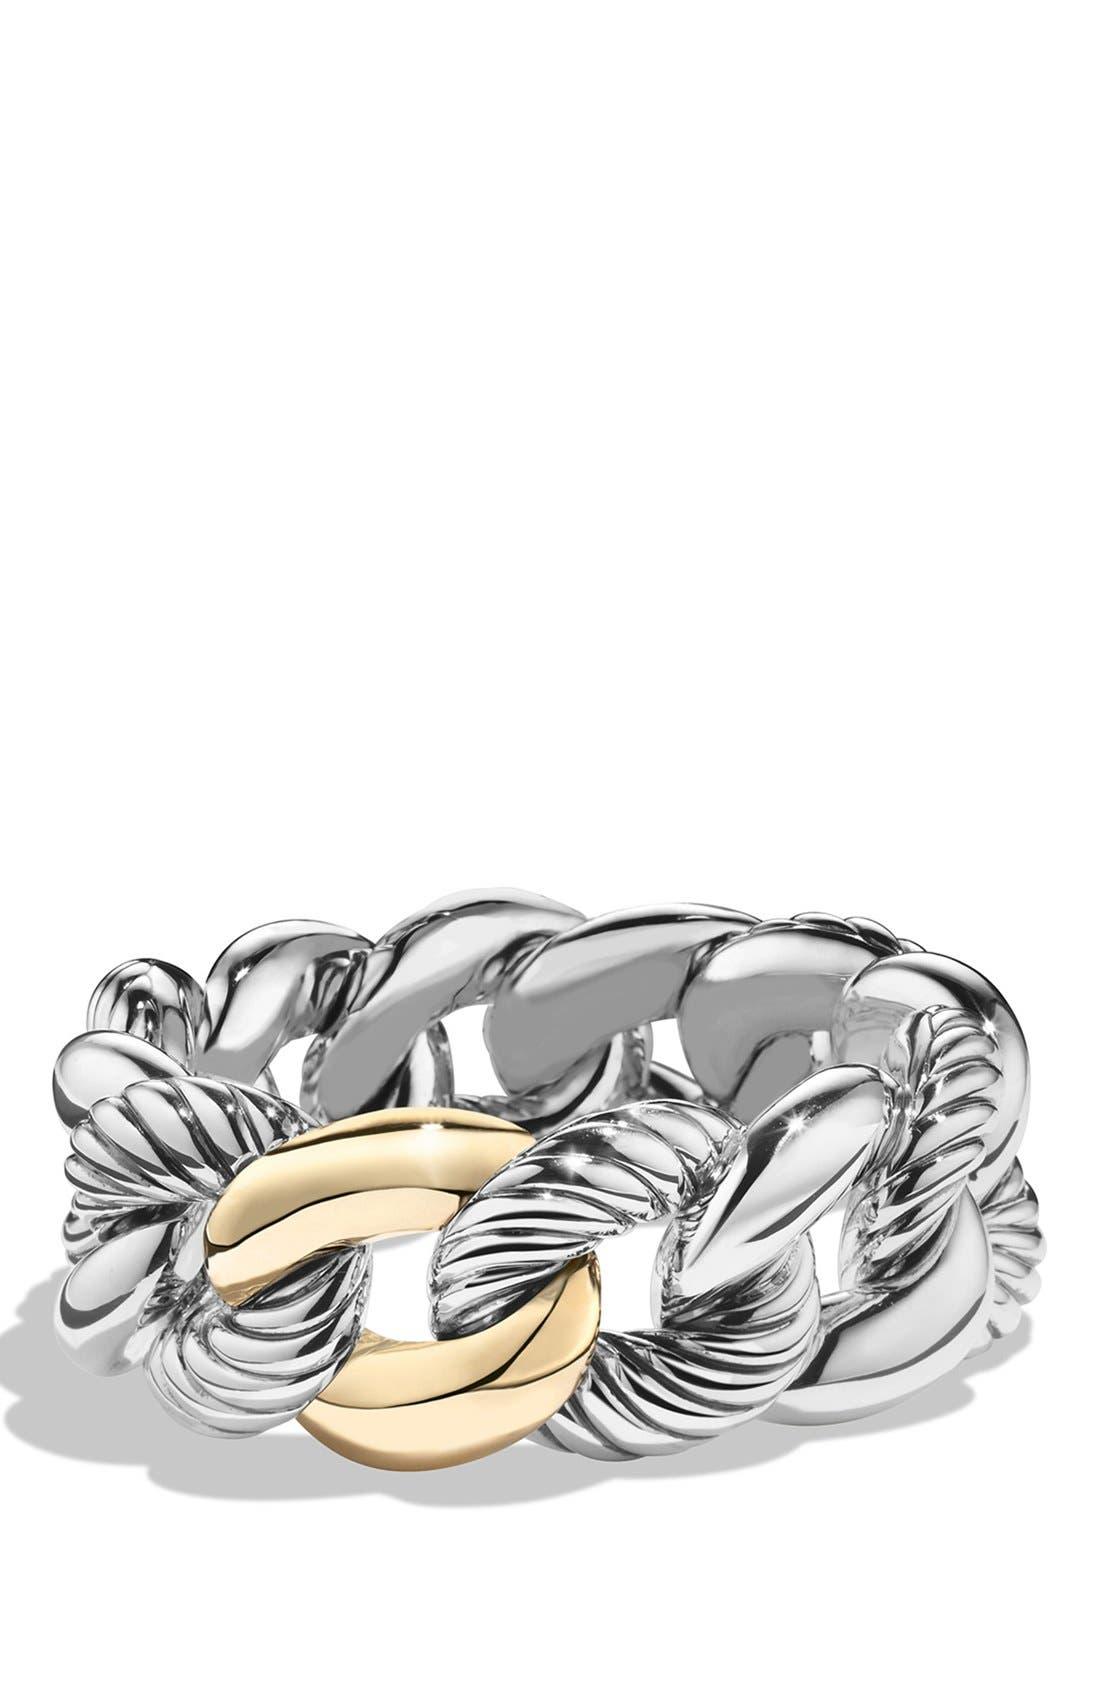 Main Image - David Yurman 'Belmont' Curb Link Bracelet with 18K Gold